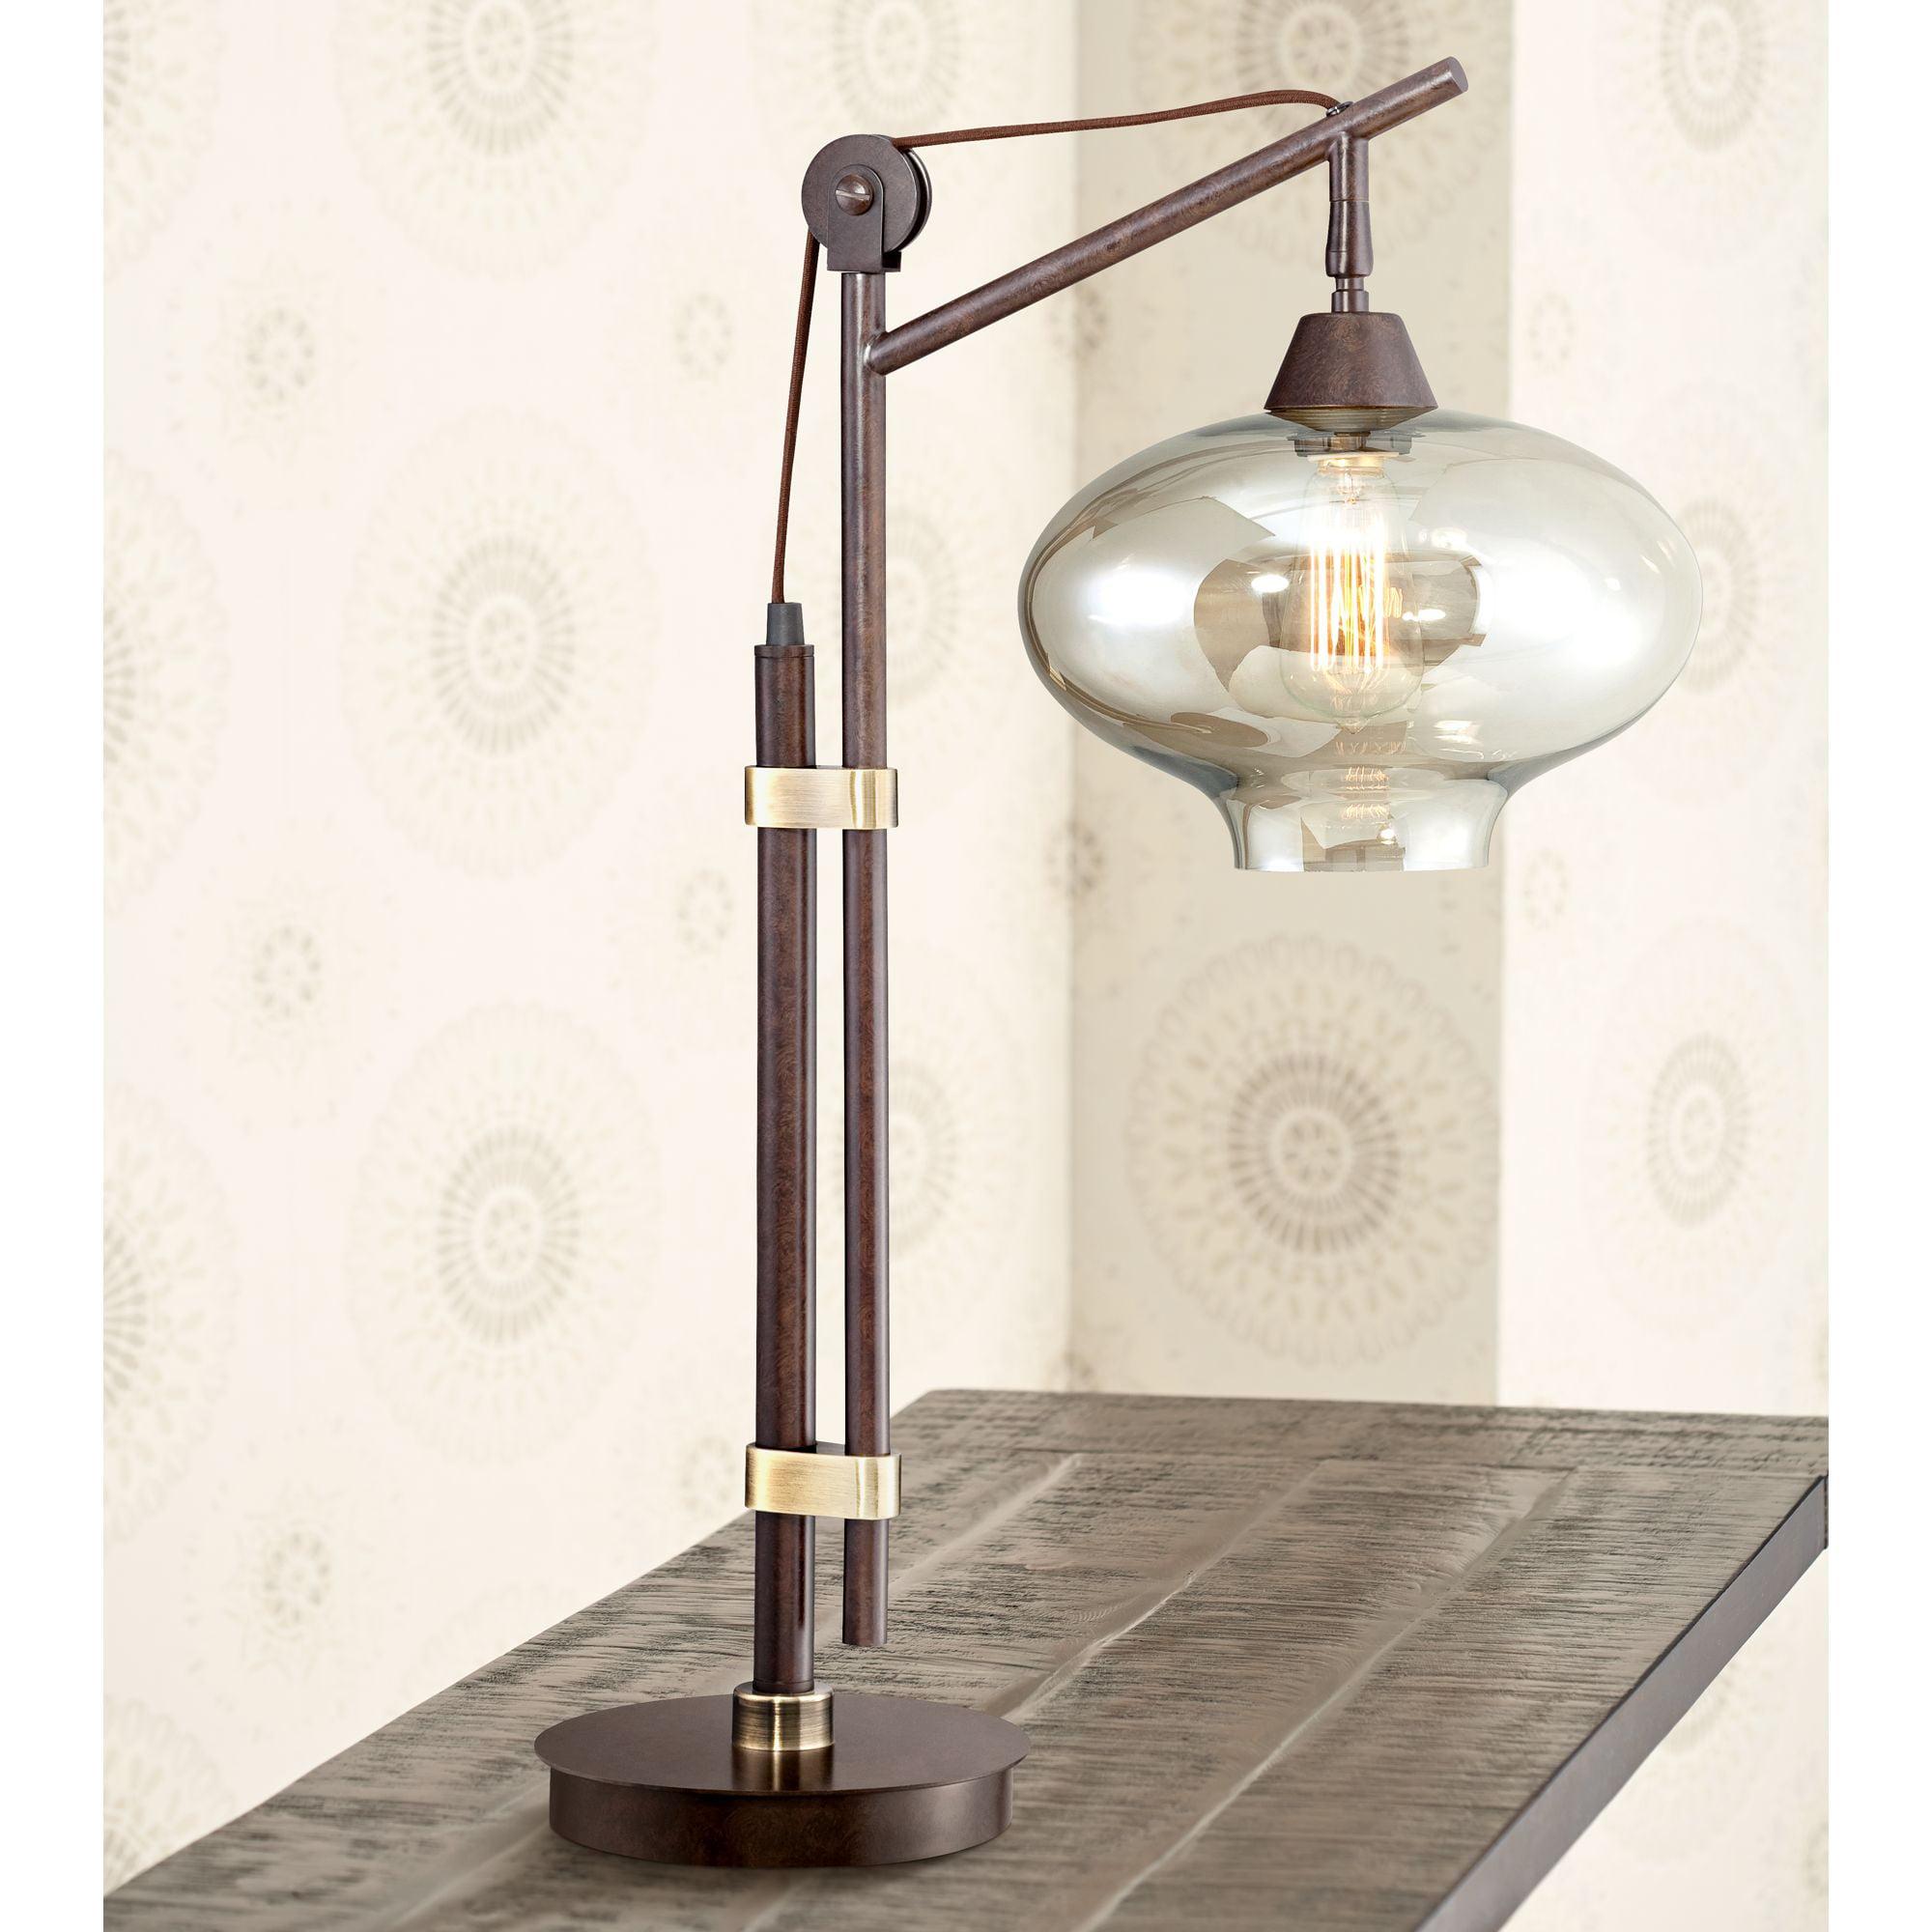 Franklin Iron Works Calyx Cognac Glass Industrial Bronze Desk Lamp by Franklin Iron Works